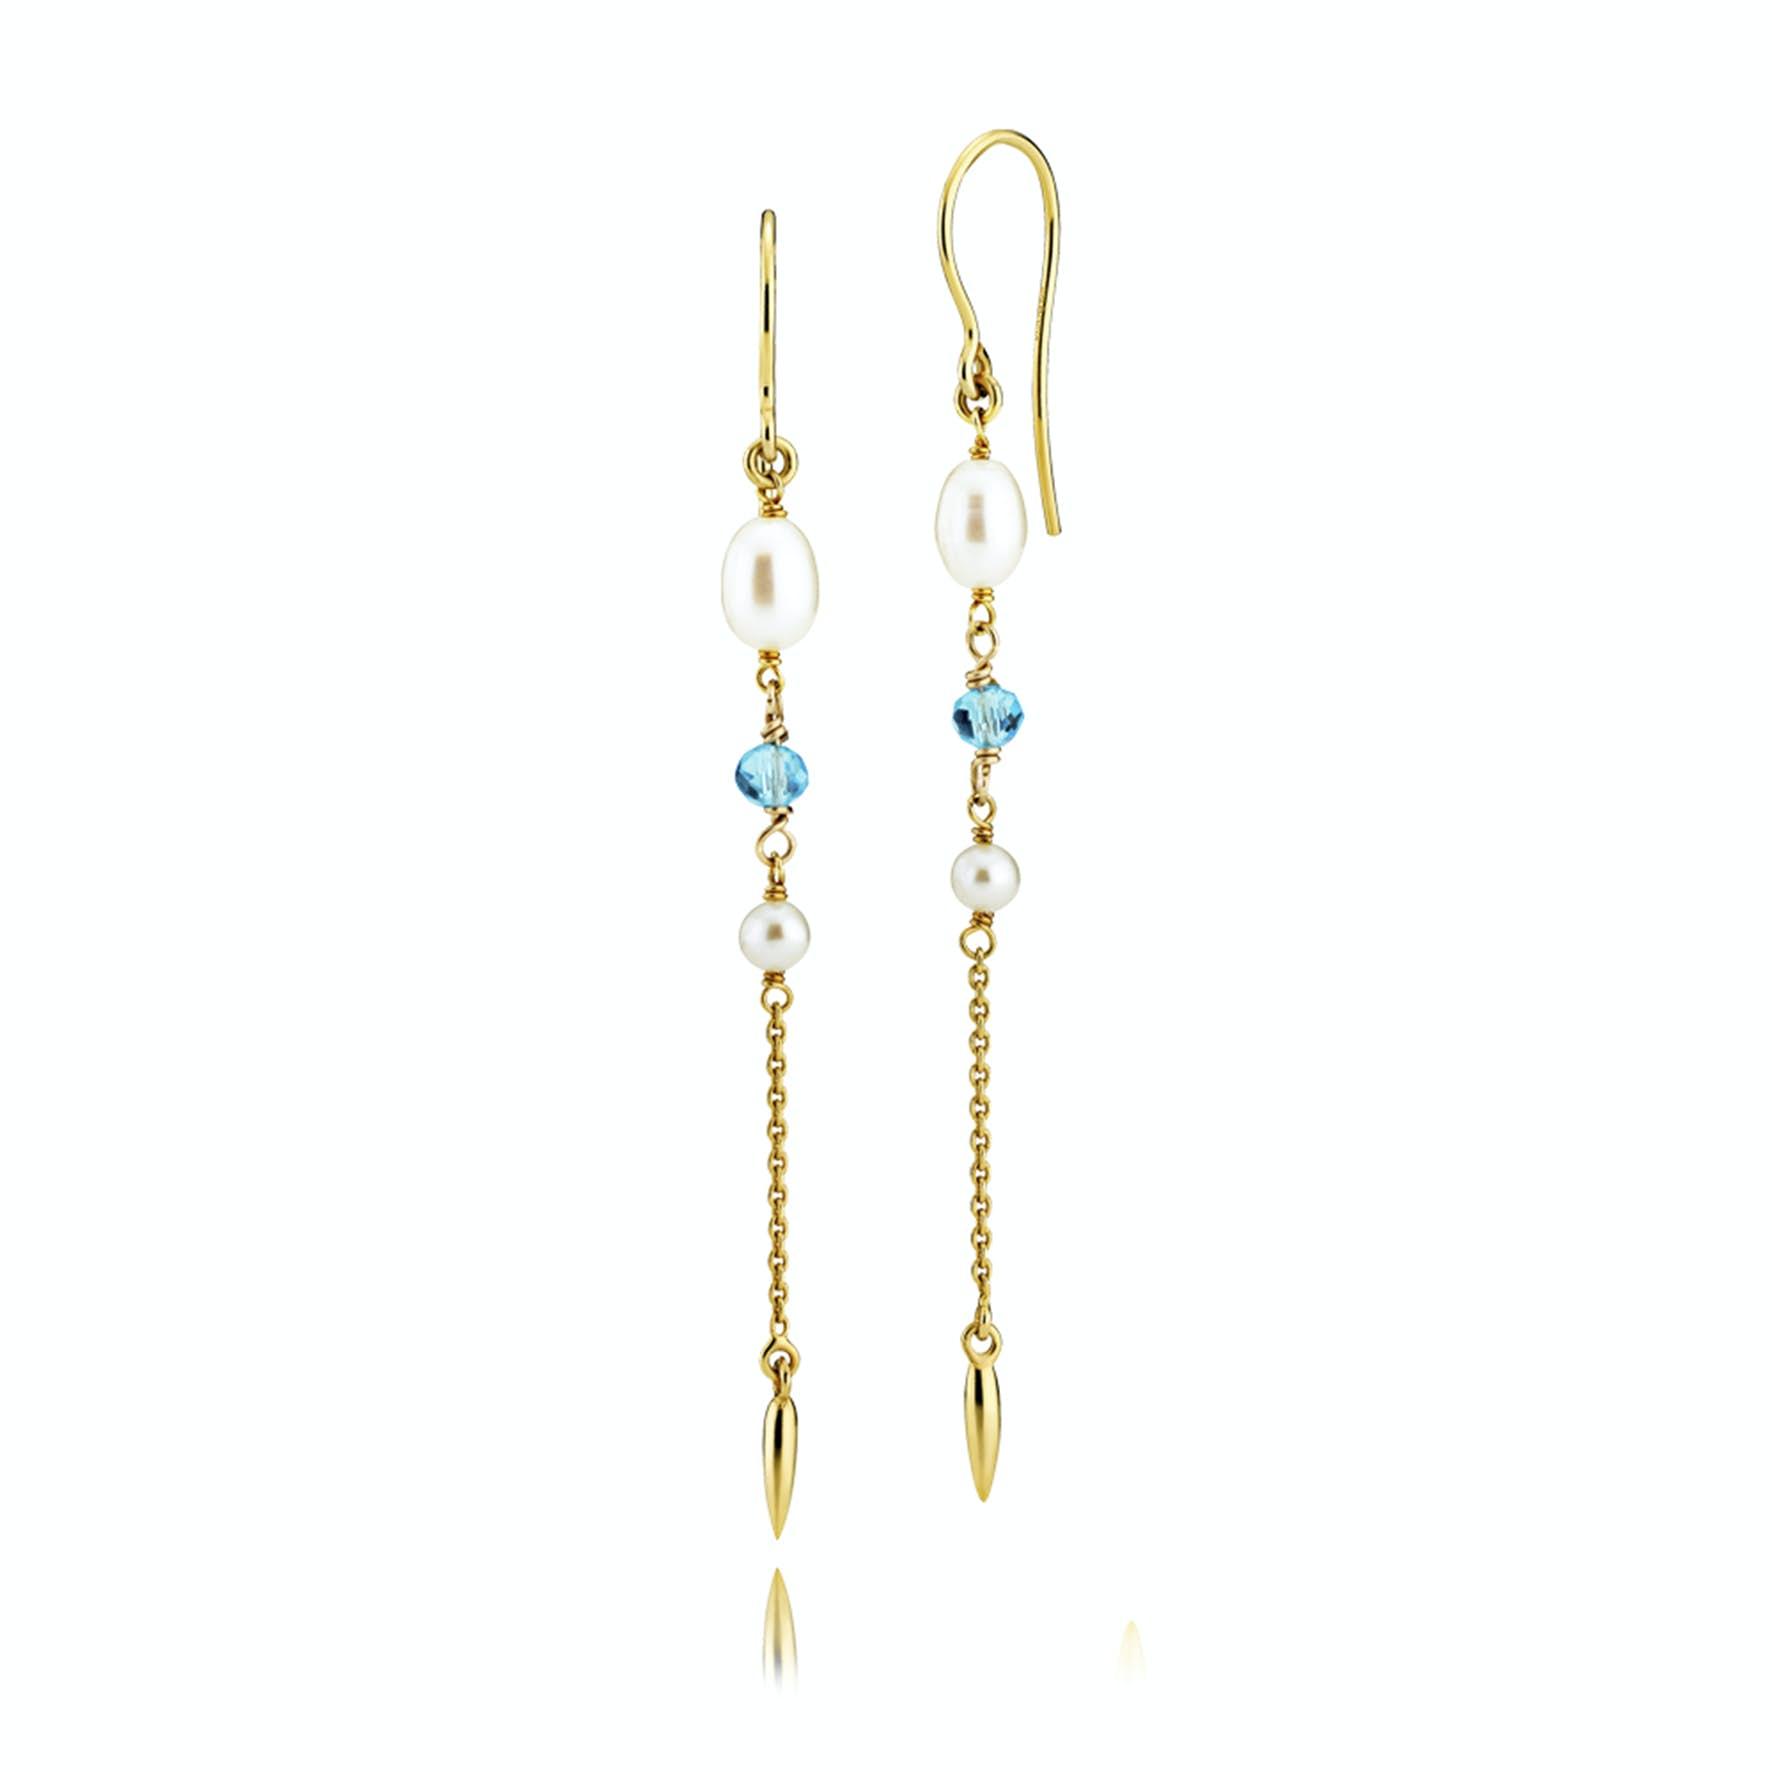 Paradise Earrings Aqua Blue von Izabel Camille in Vergoldet-Silber Sterling 925|Aqua Blue